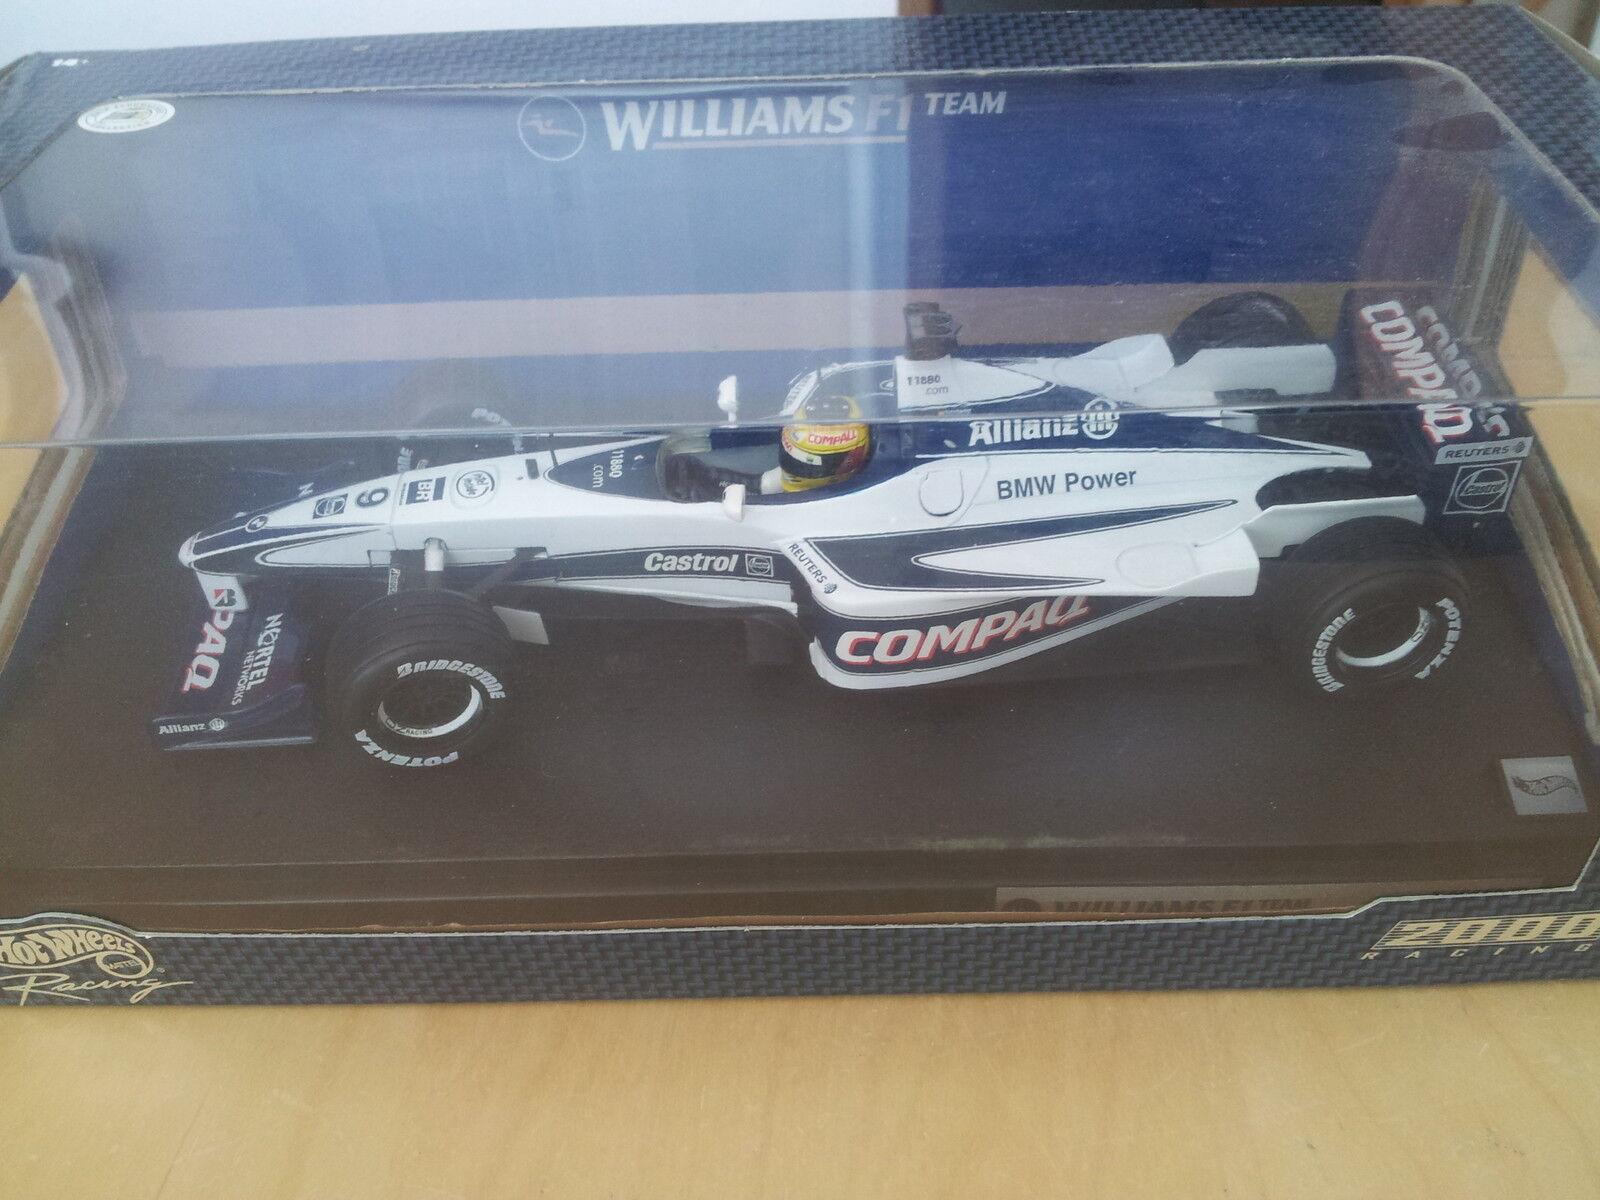 HOT WHEELS RACING 1 18 - f1 Williams BMW (Ralf Schumacher) - NEUF & neuf dans sa boîte